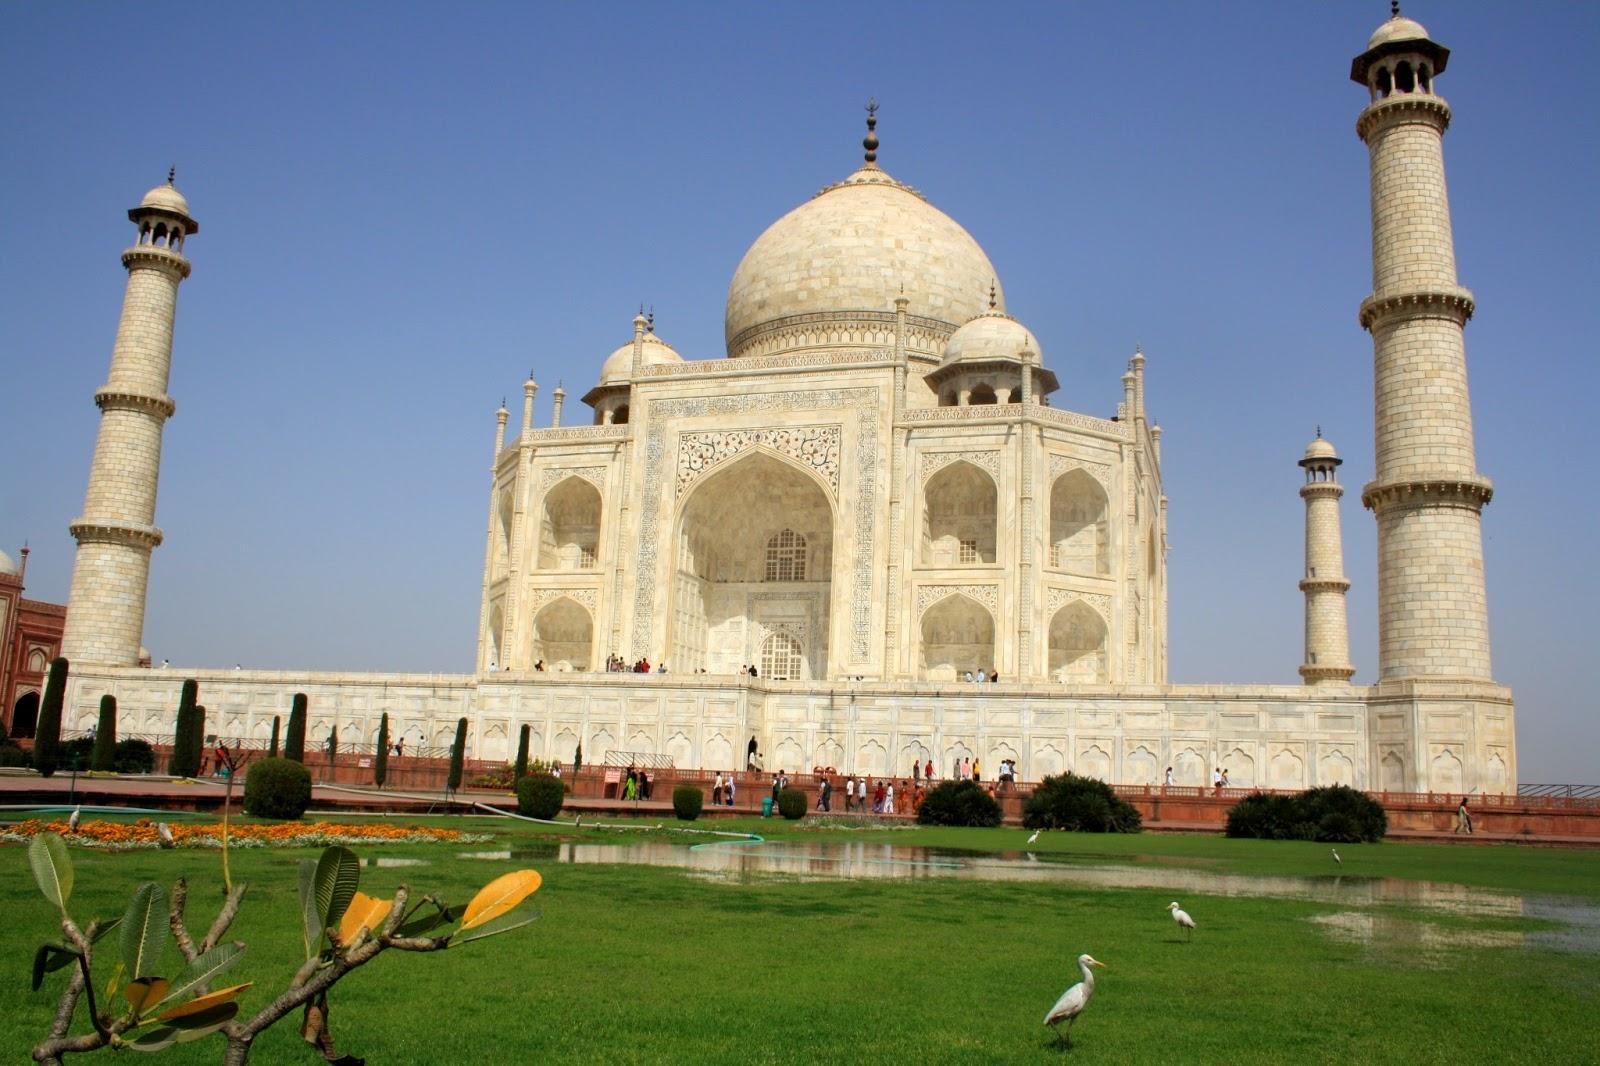 Hd Wallpapers Free India 7wonder Of The World Taj Mahal Full Hd